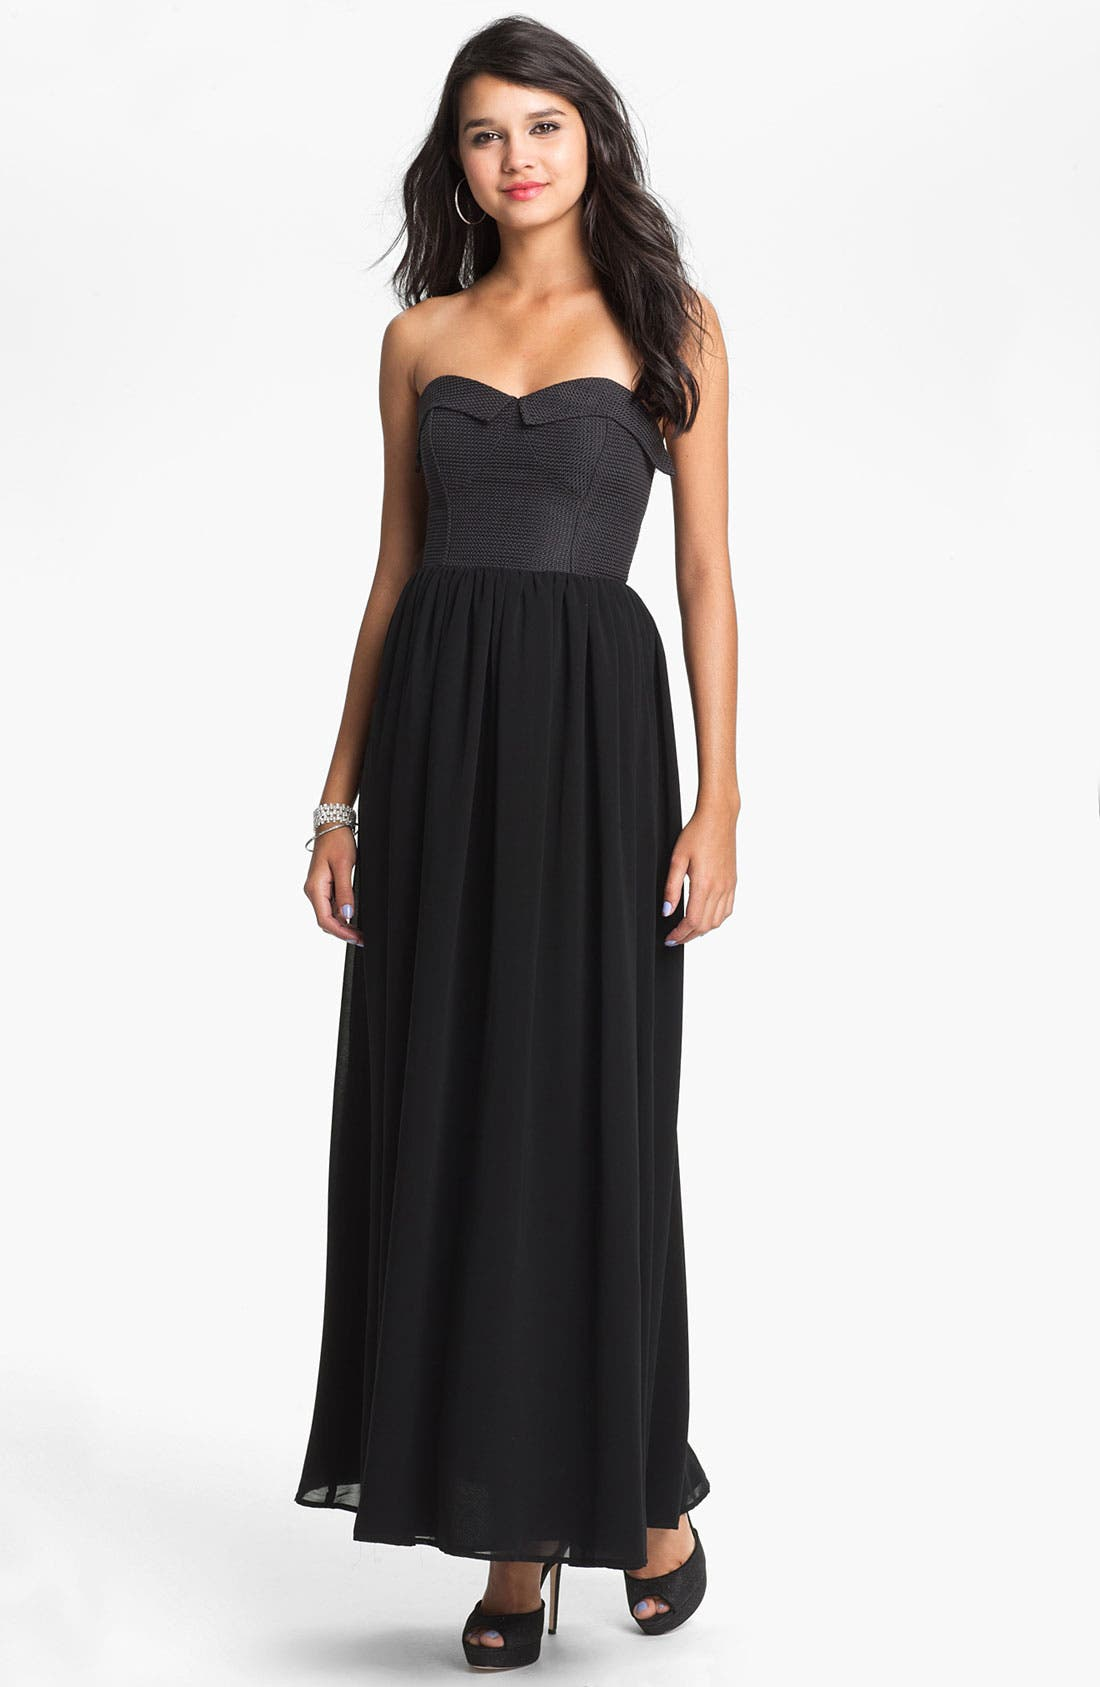 Alternate Image 1 Selected - Keepsake the Label 'To Be Free' Maxi Dress